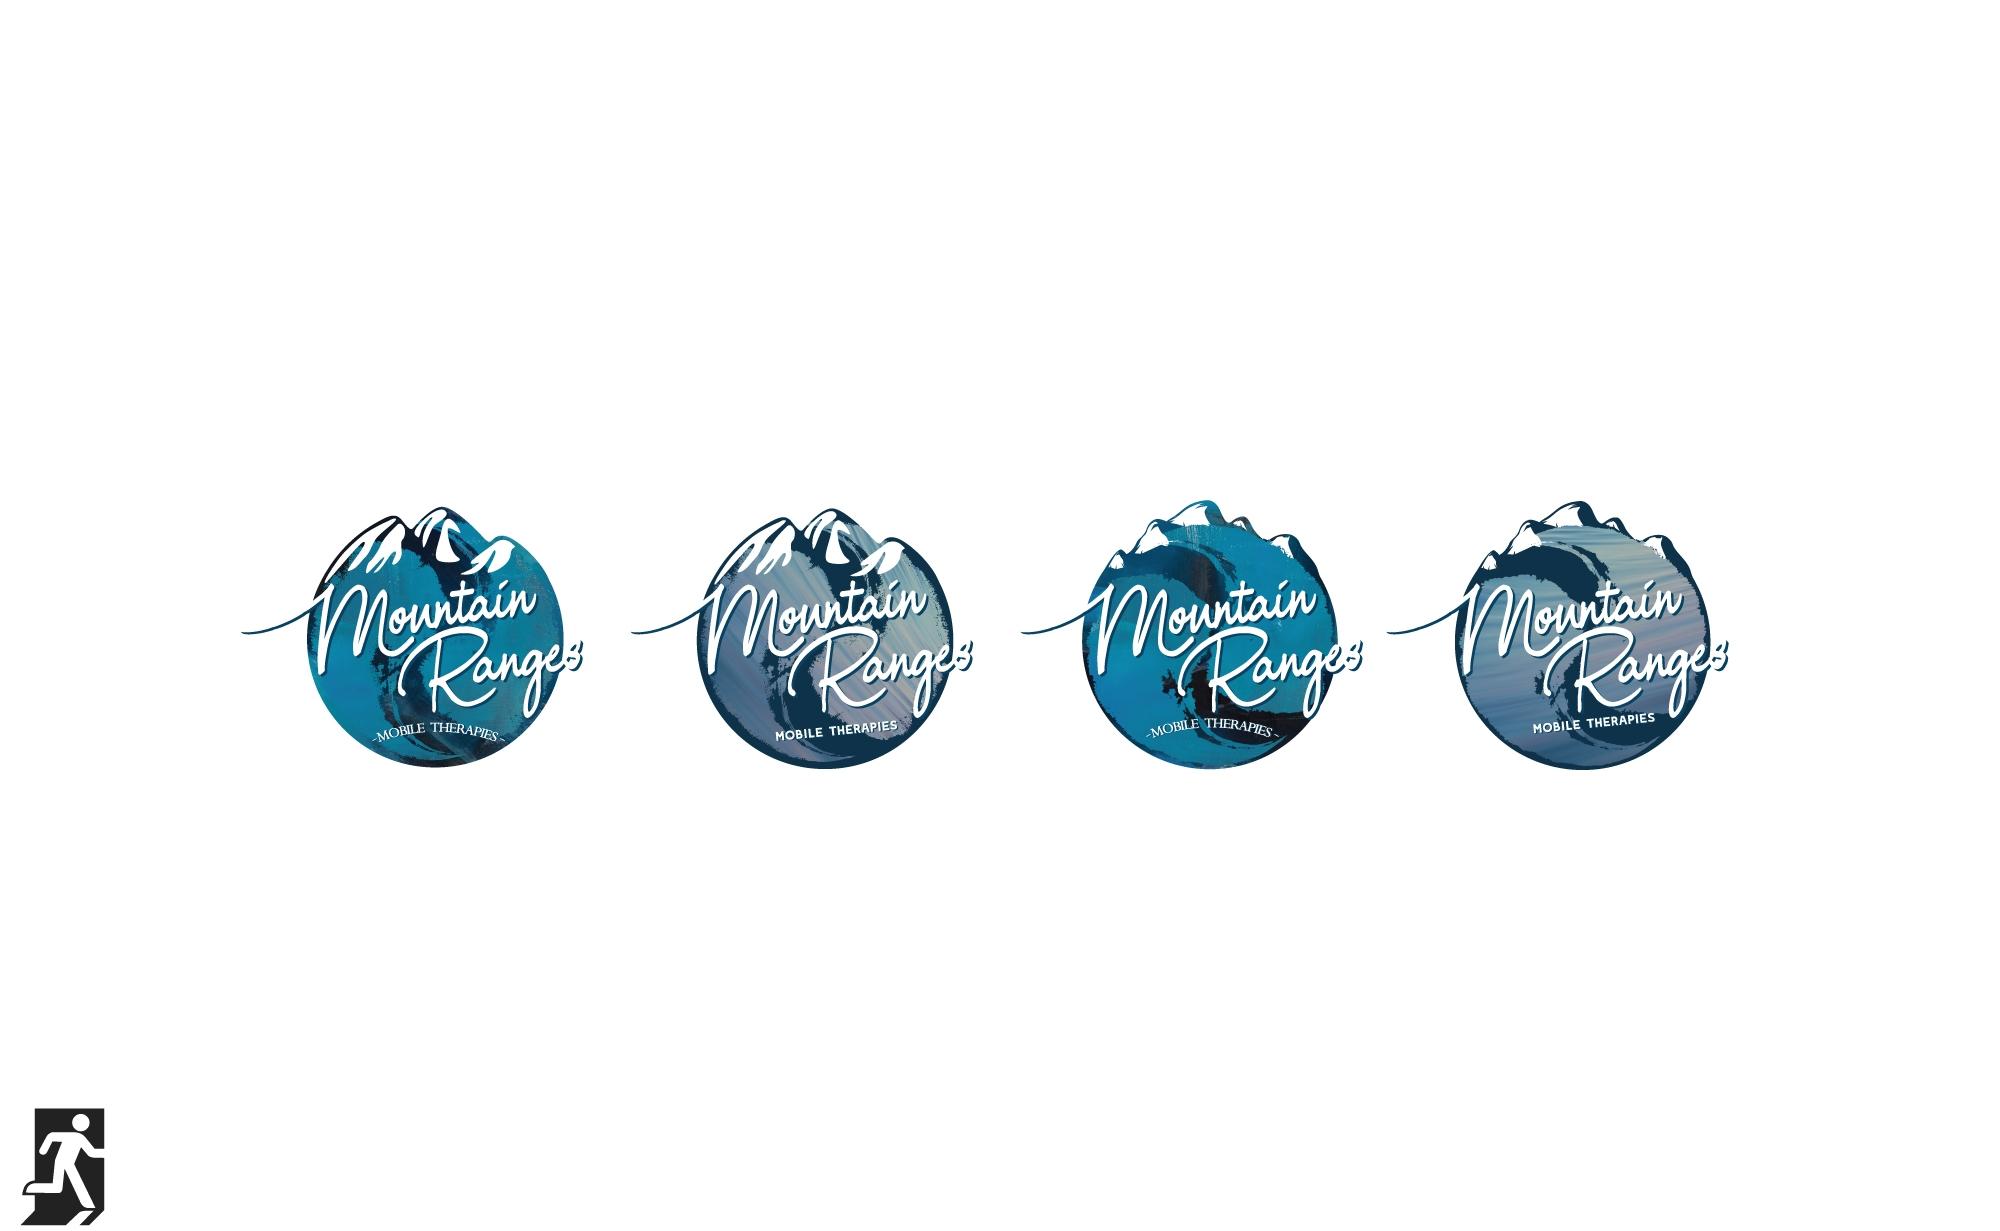 final-logo-option-developments-ver01.jpg